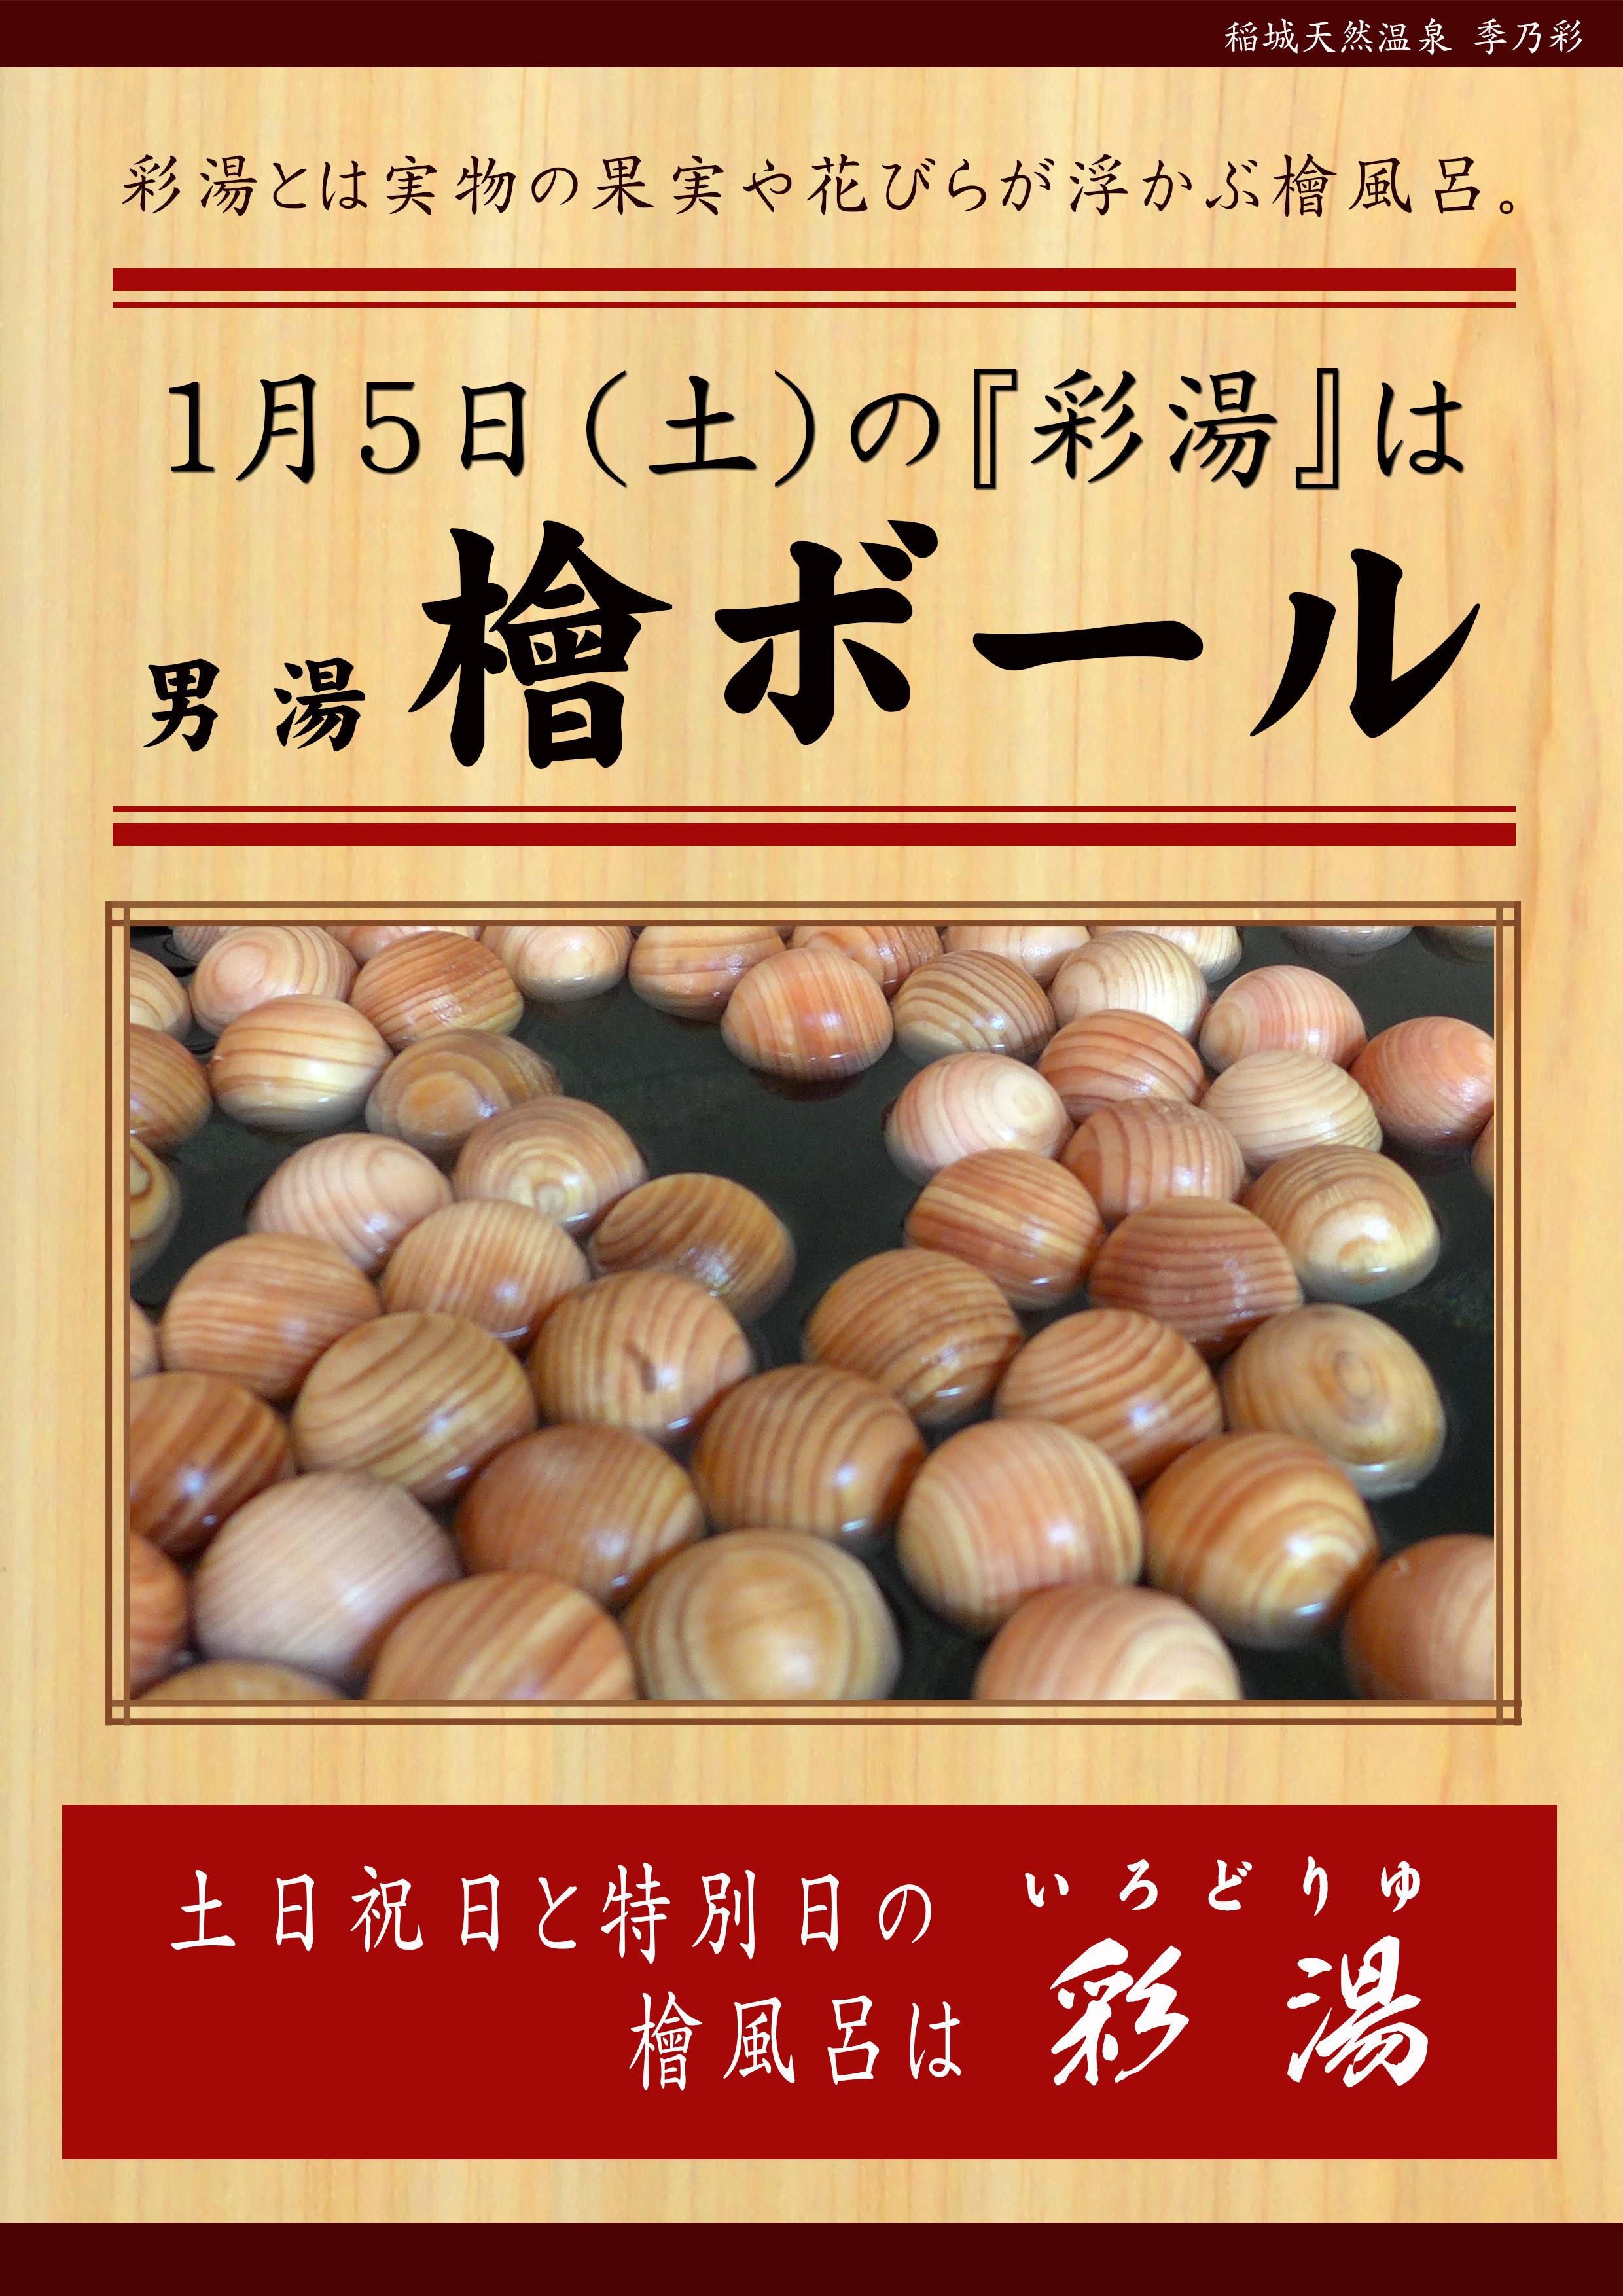 20190105POP イベント 彩湯 男湯 檜ボール